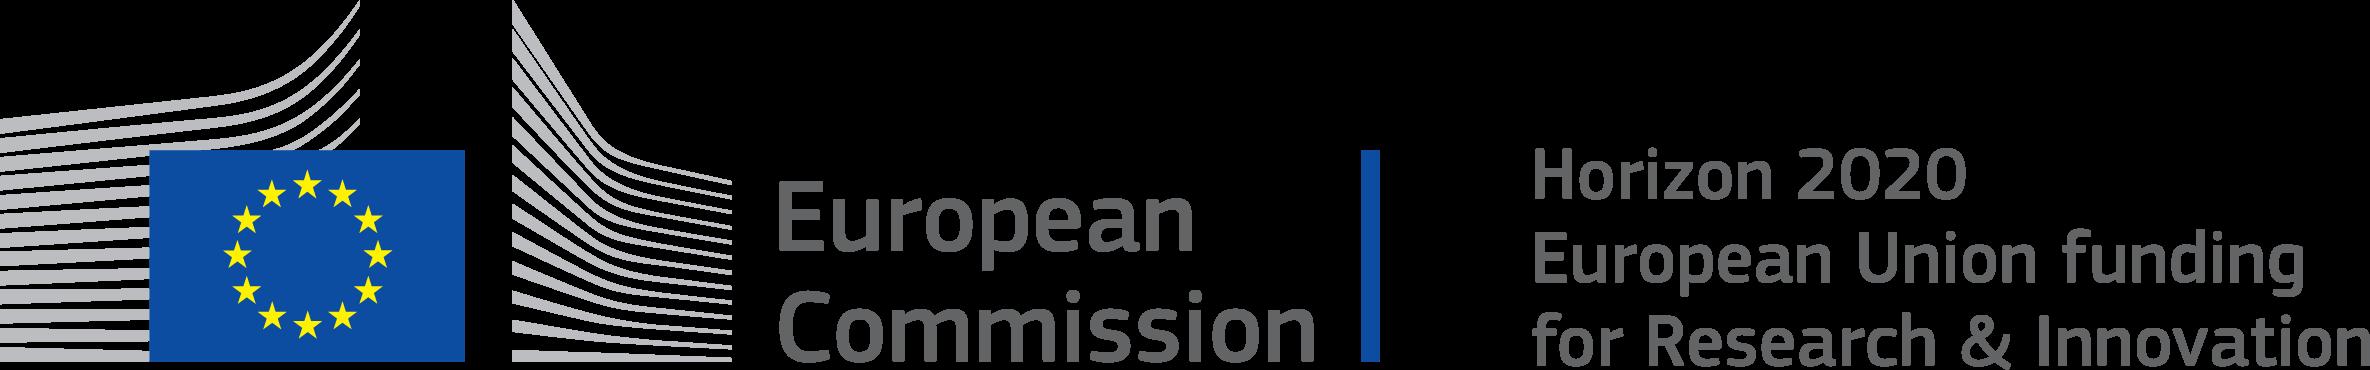 European Commission H2020 program logo